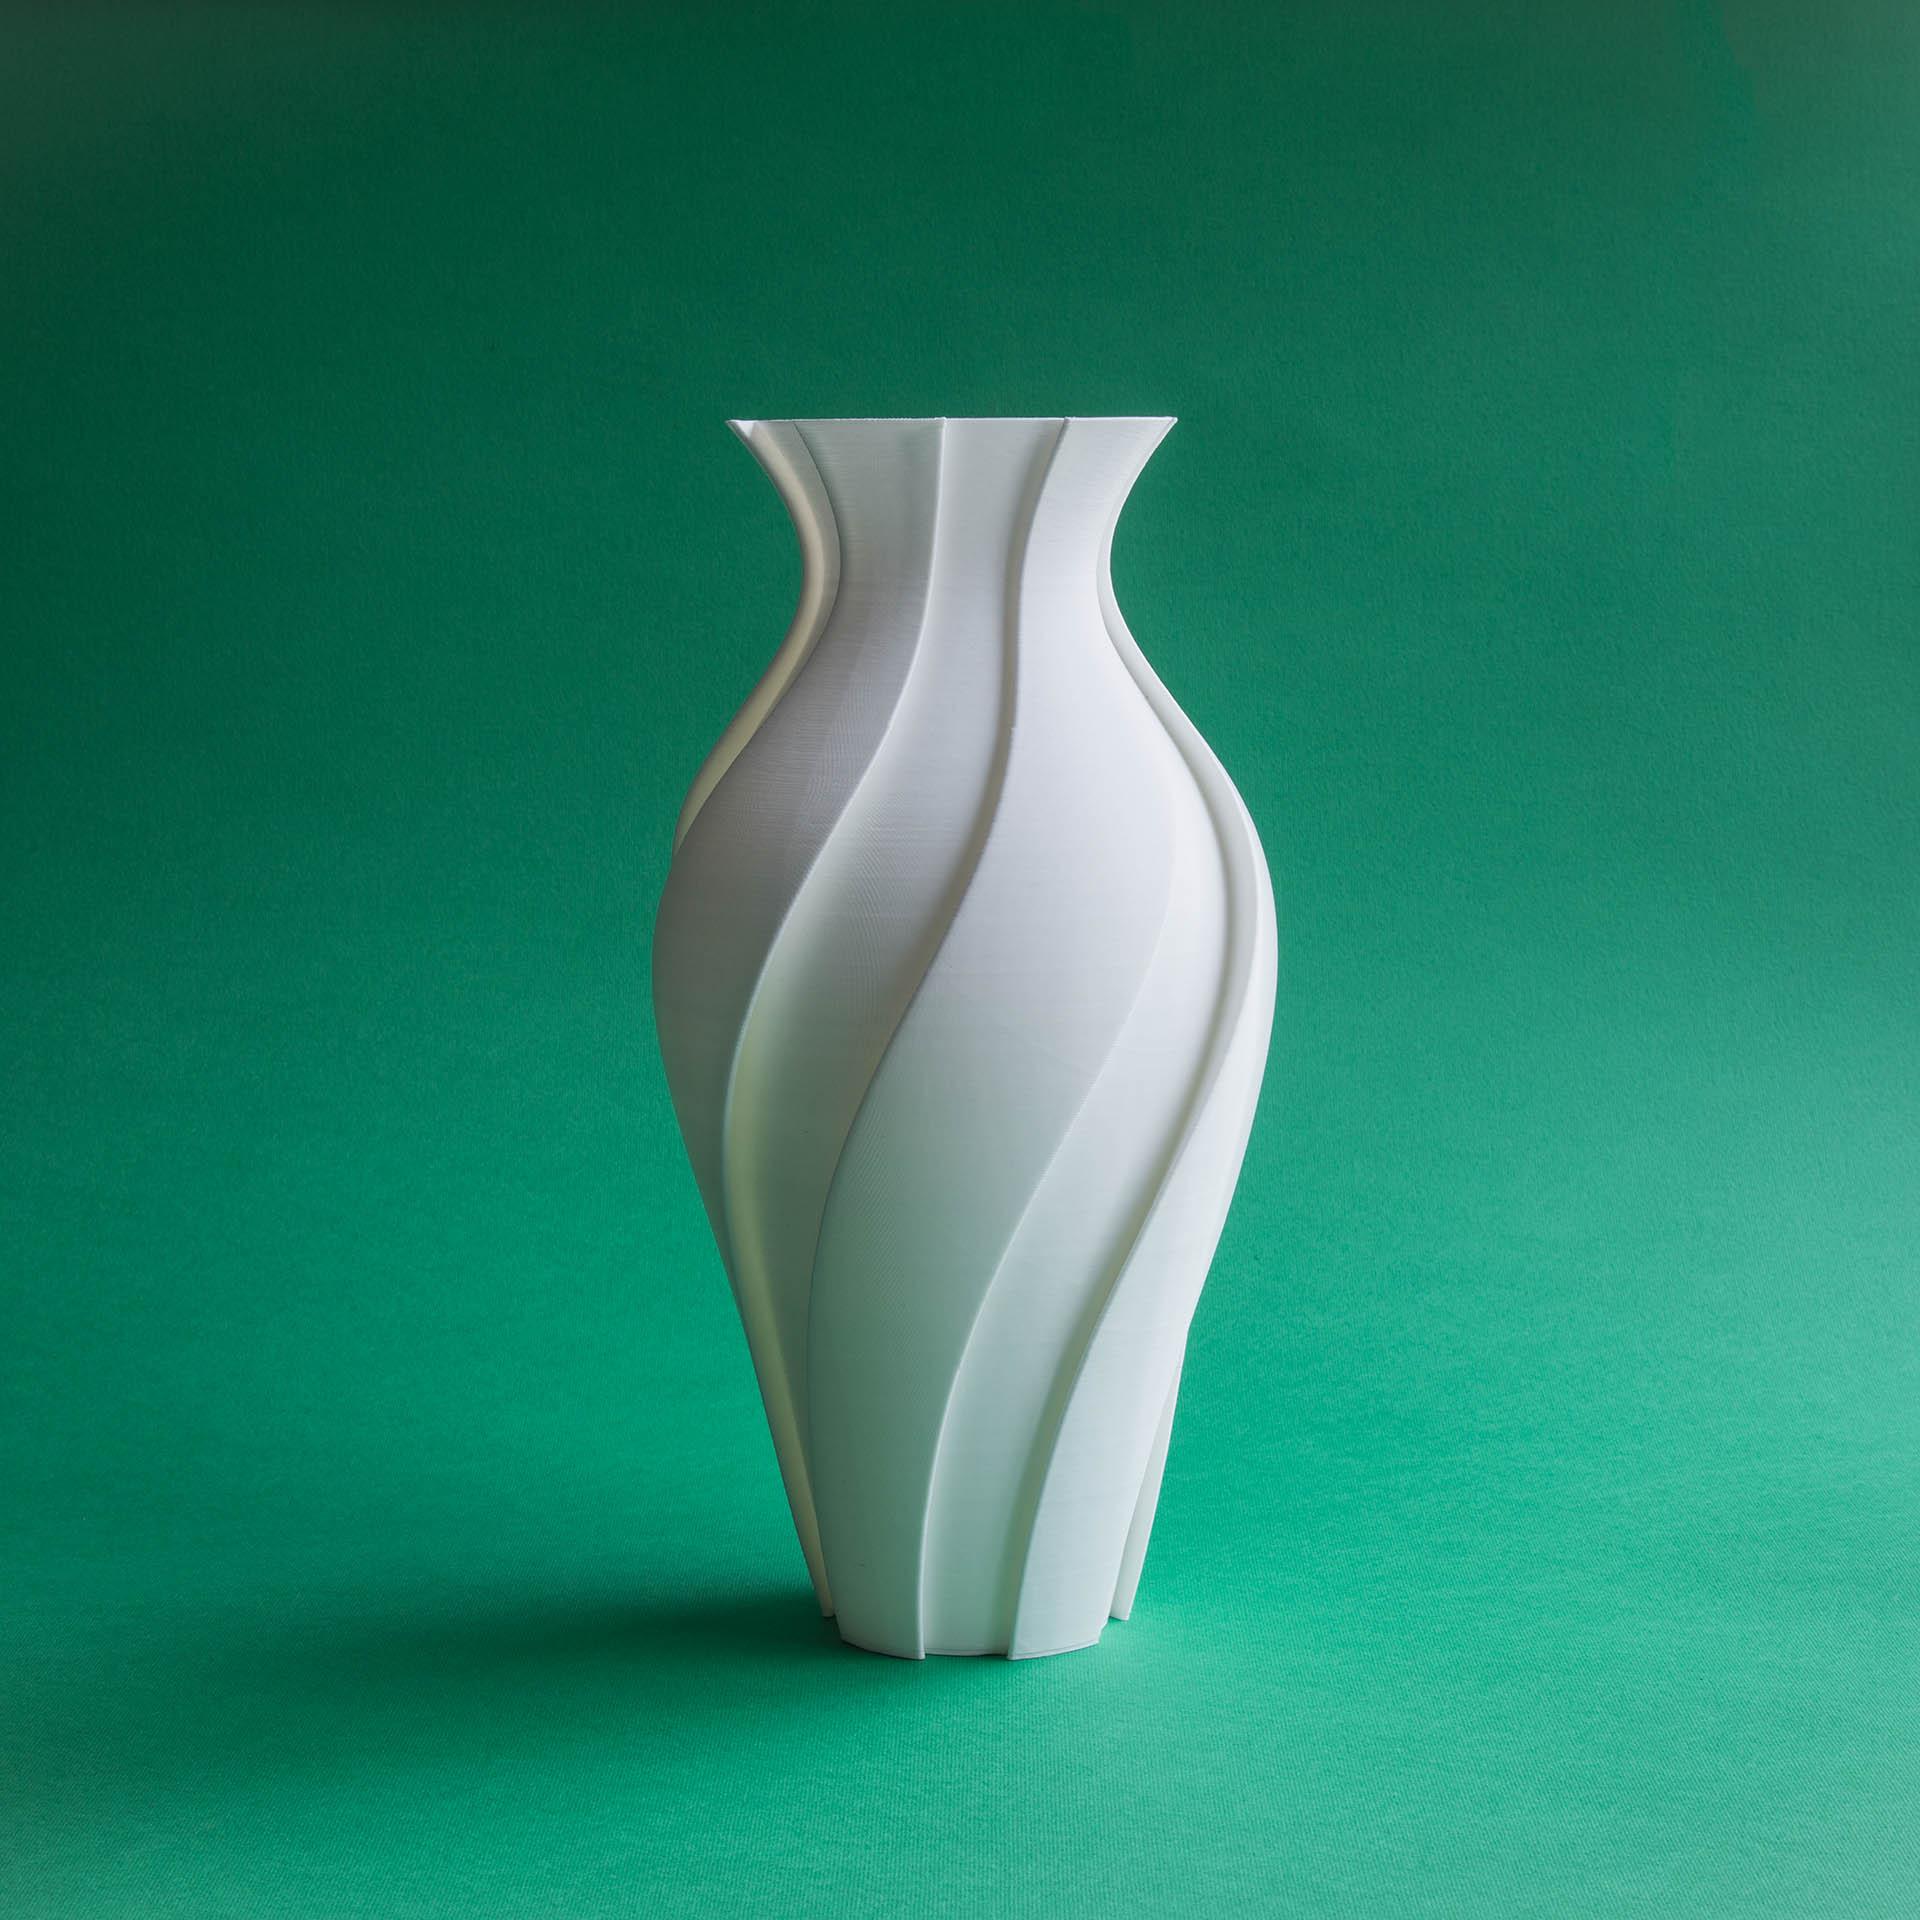 Vásame Krater, Adriano Alfaro, vaso stampato 3D